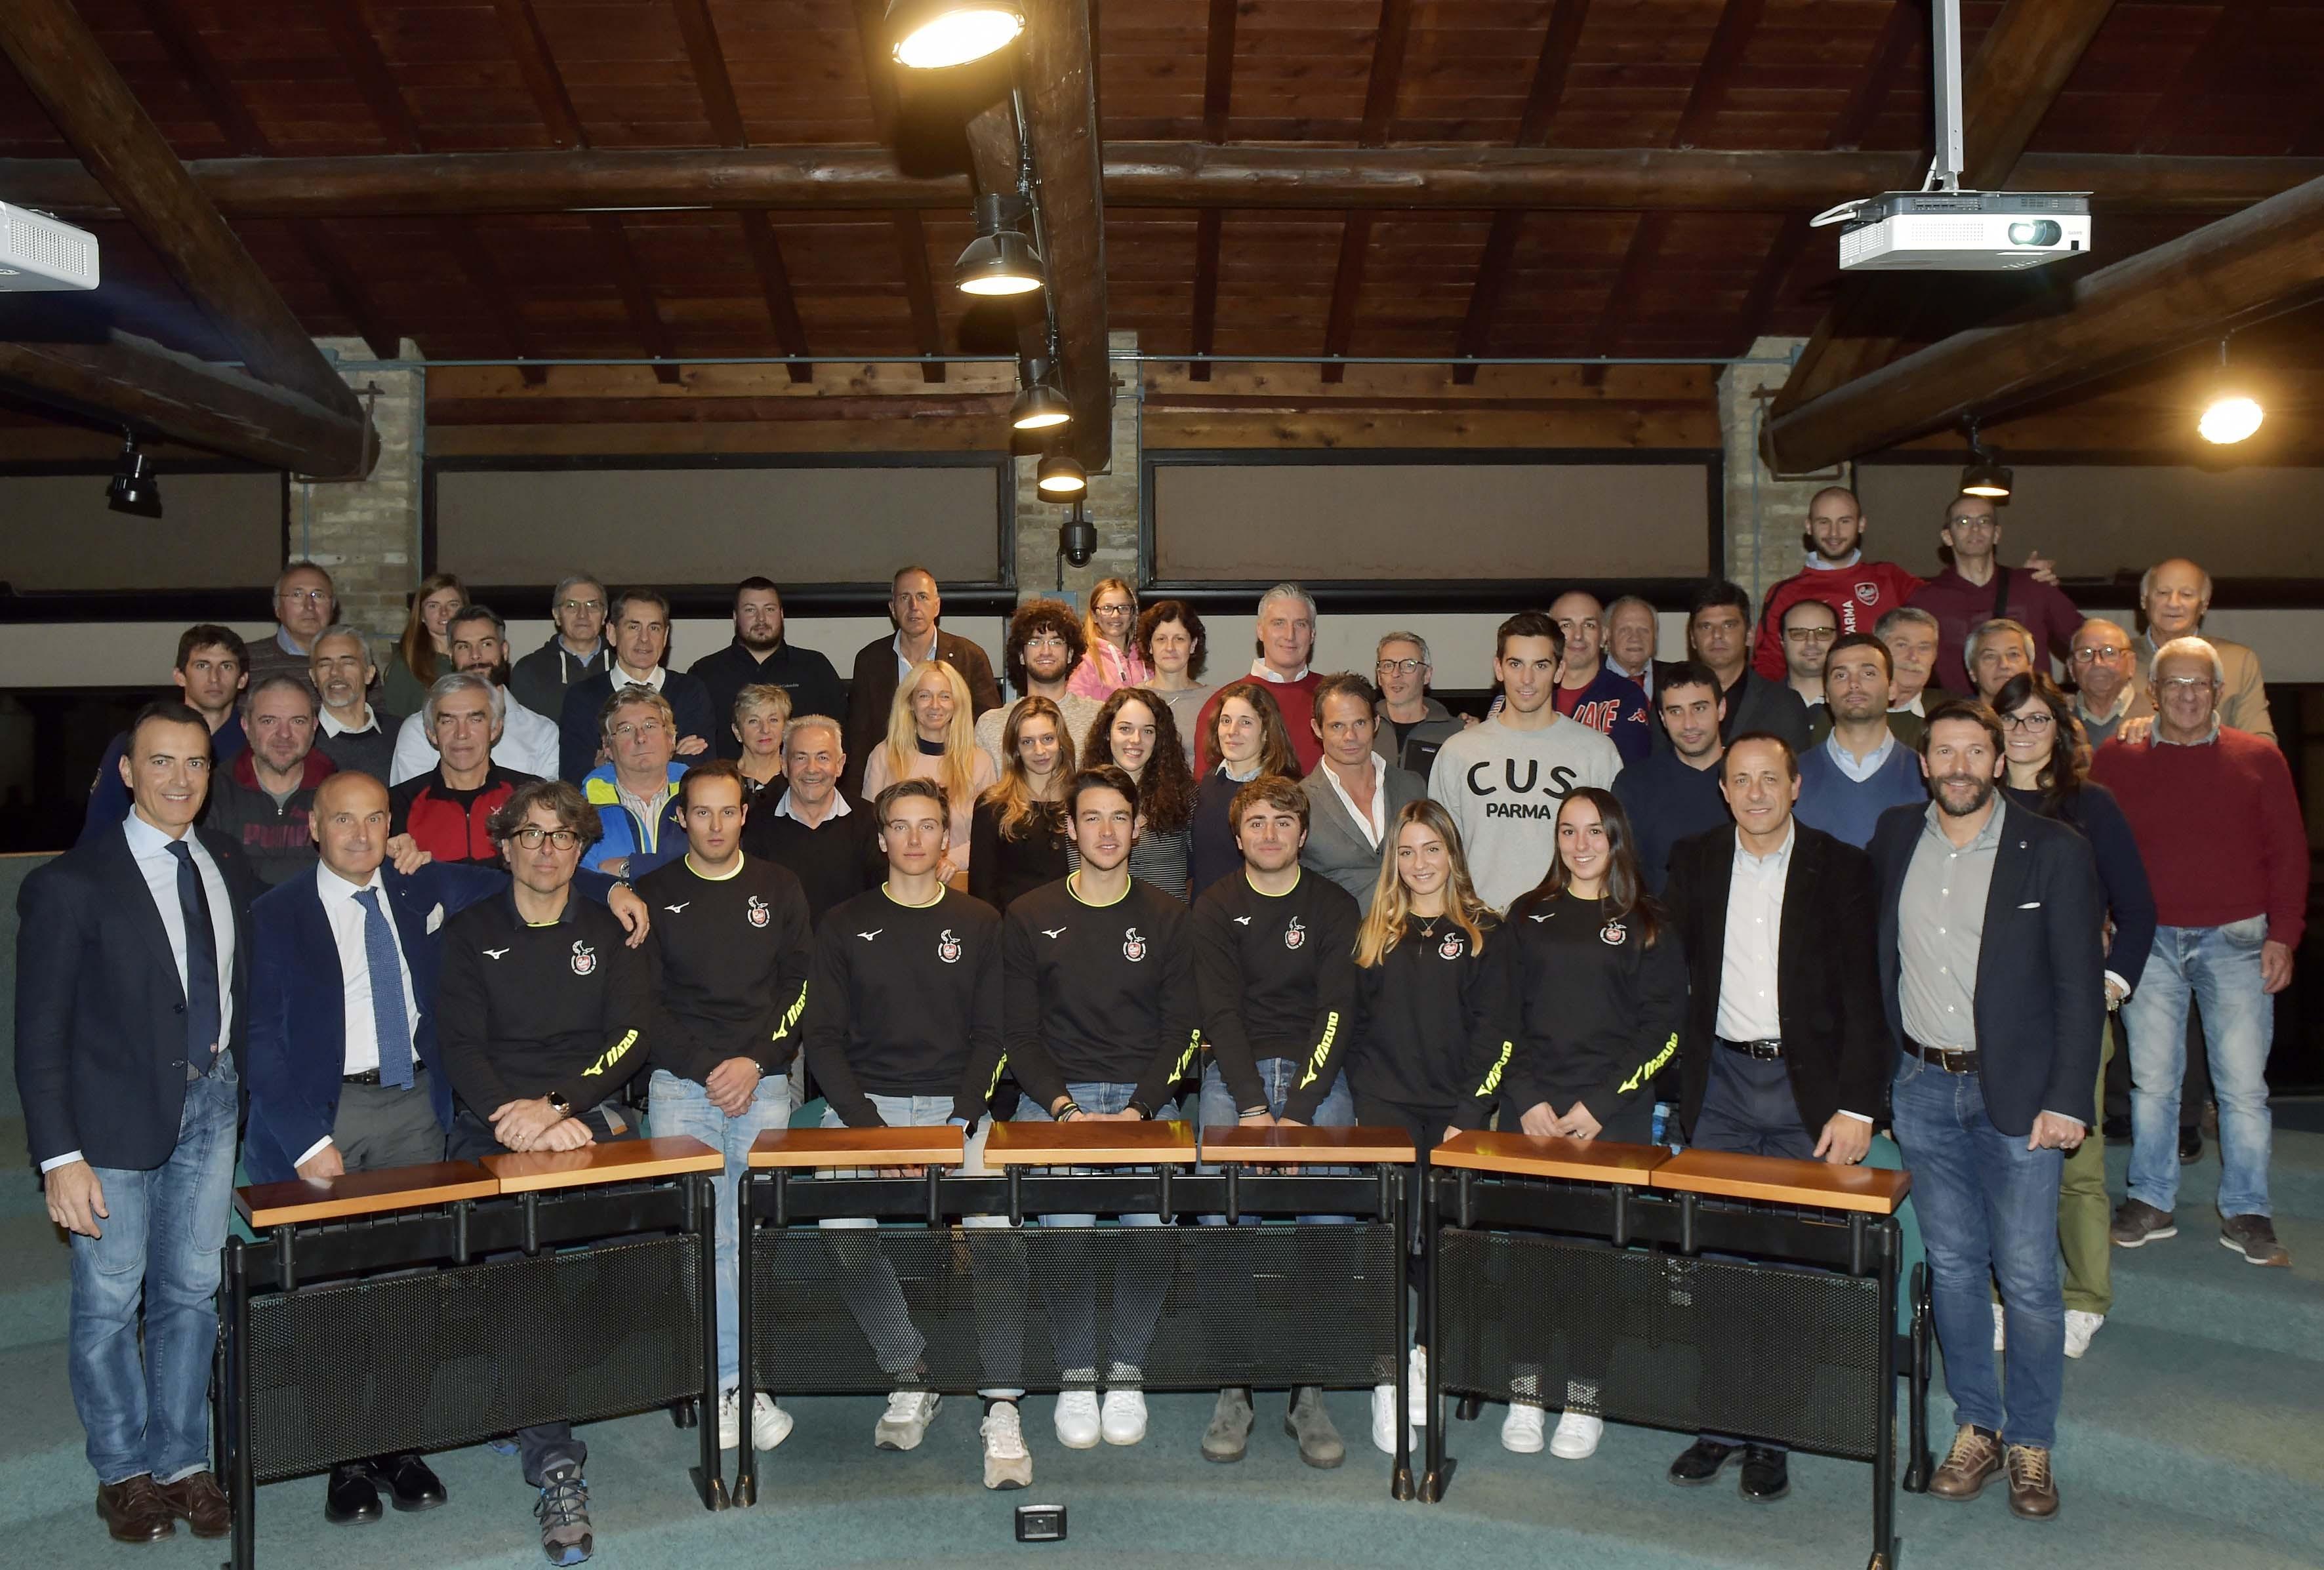 Calendario 2019 Ottobre Más Reciente Sport Invernali – Cus Parma A S D Of Calendario 2019 Ottobre Más Arriba-a-fecha 29 Best Converged Data Center Images On Pinterest